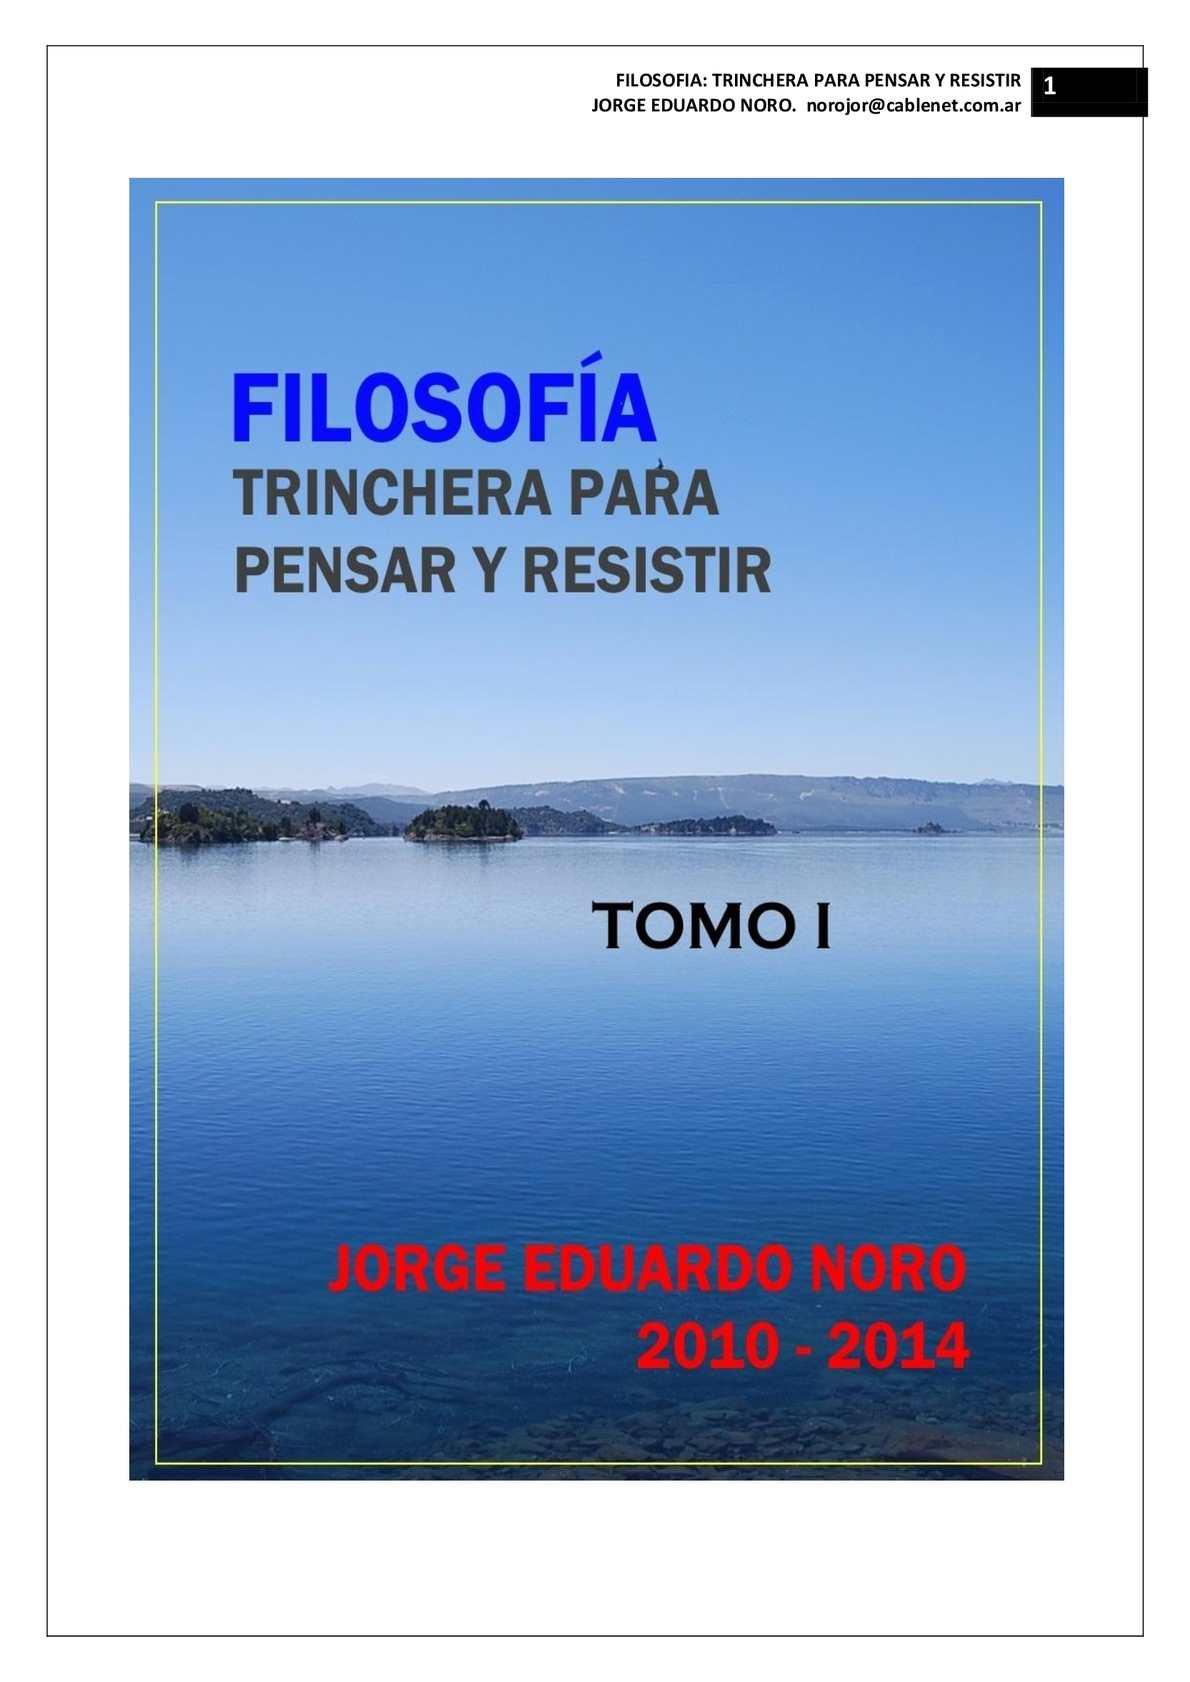 Calaméo - 187. FILOSOFIA: TRINCHERA PARA PENSAR Y PARA RESISTIR + TOMO I